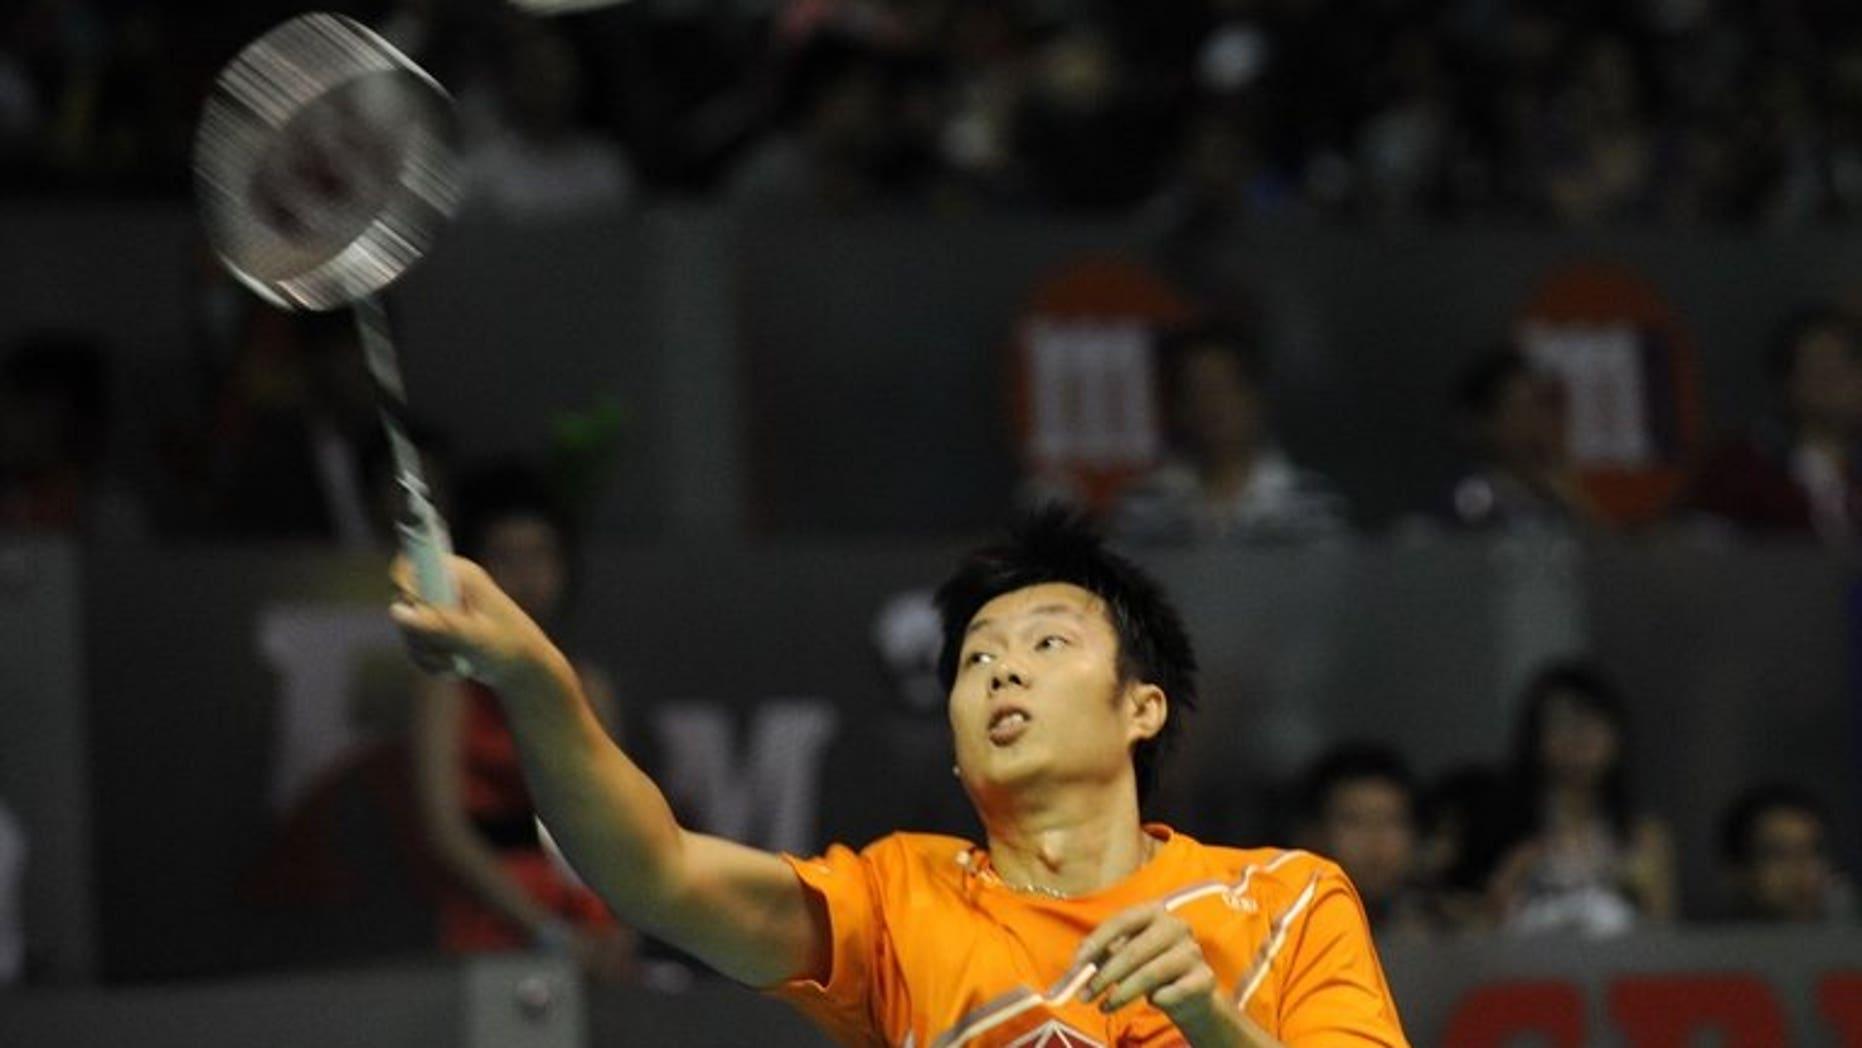 Thailand's Boonsak Ponsana hits a return against Japan's Ueda Takuma during their men's singles semi-final badminton match at the Singapore Open on June 22, 2013. Boonsak won 21-8, 21-15.